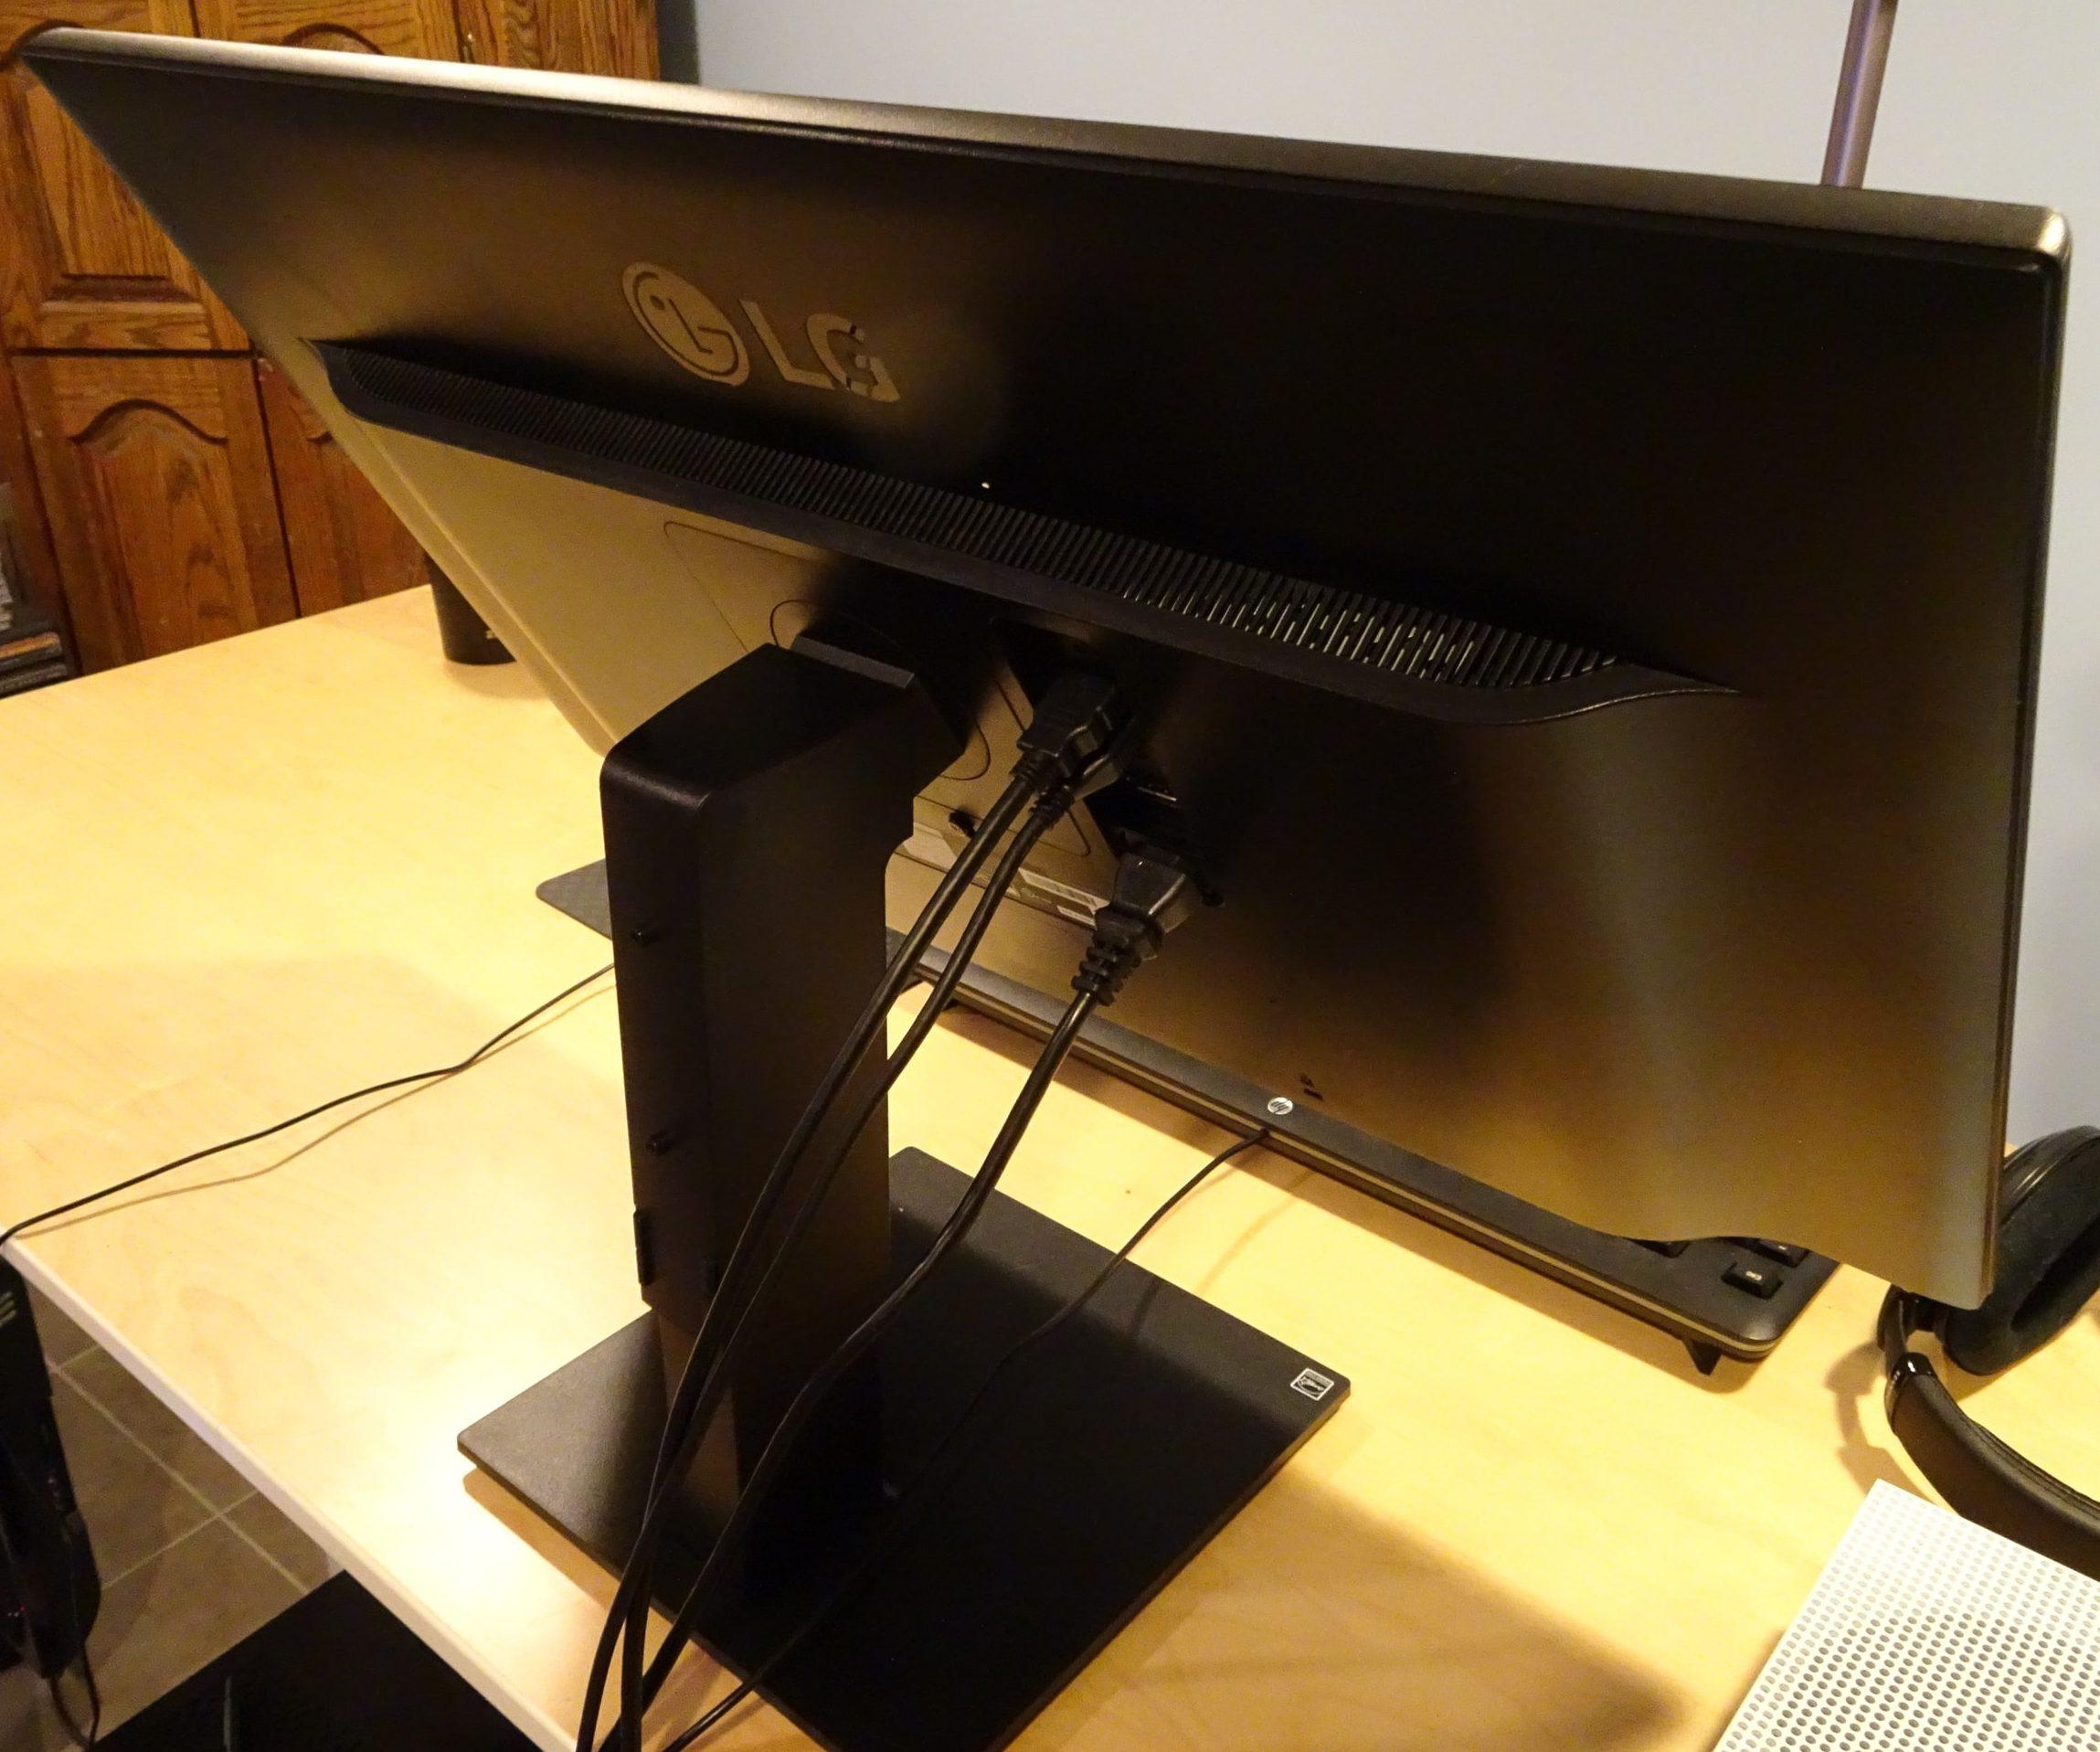 LG 4K UHD FreeSync Gaming Monitor 27UD59P Full